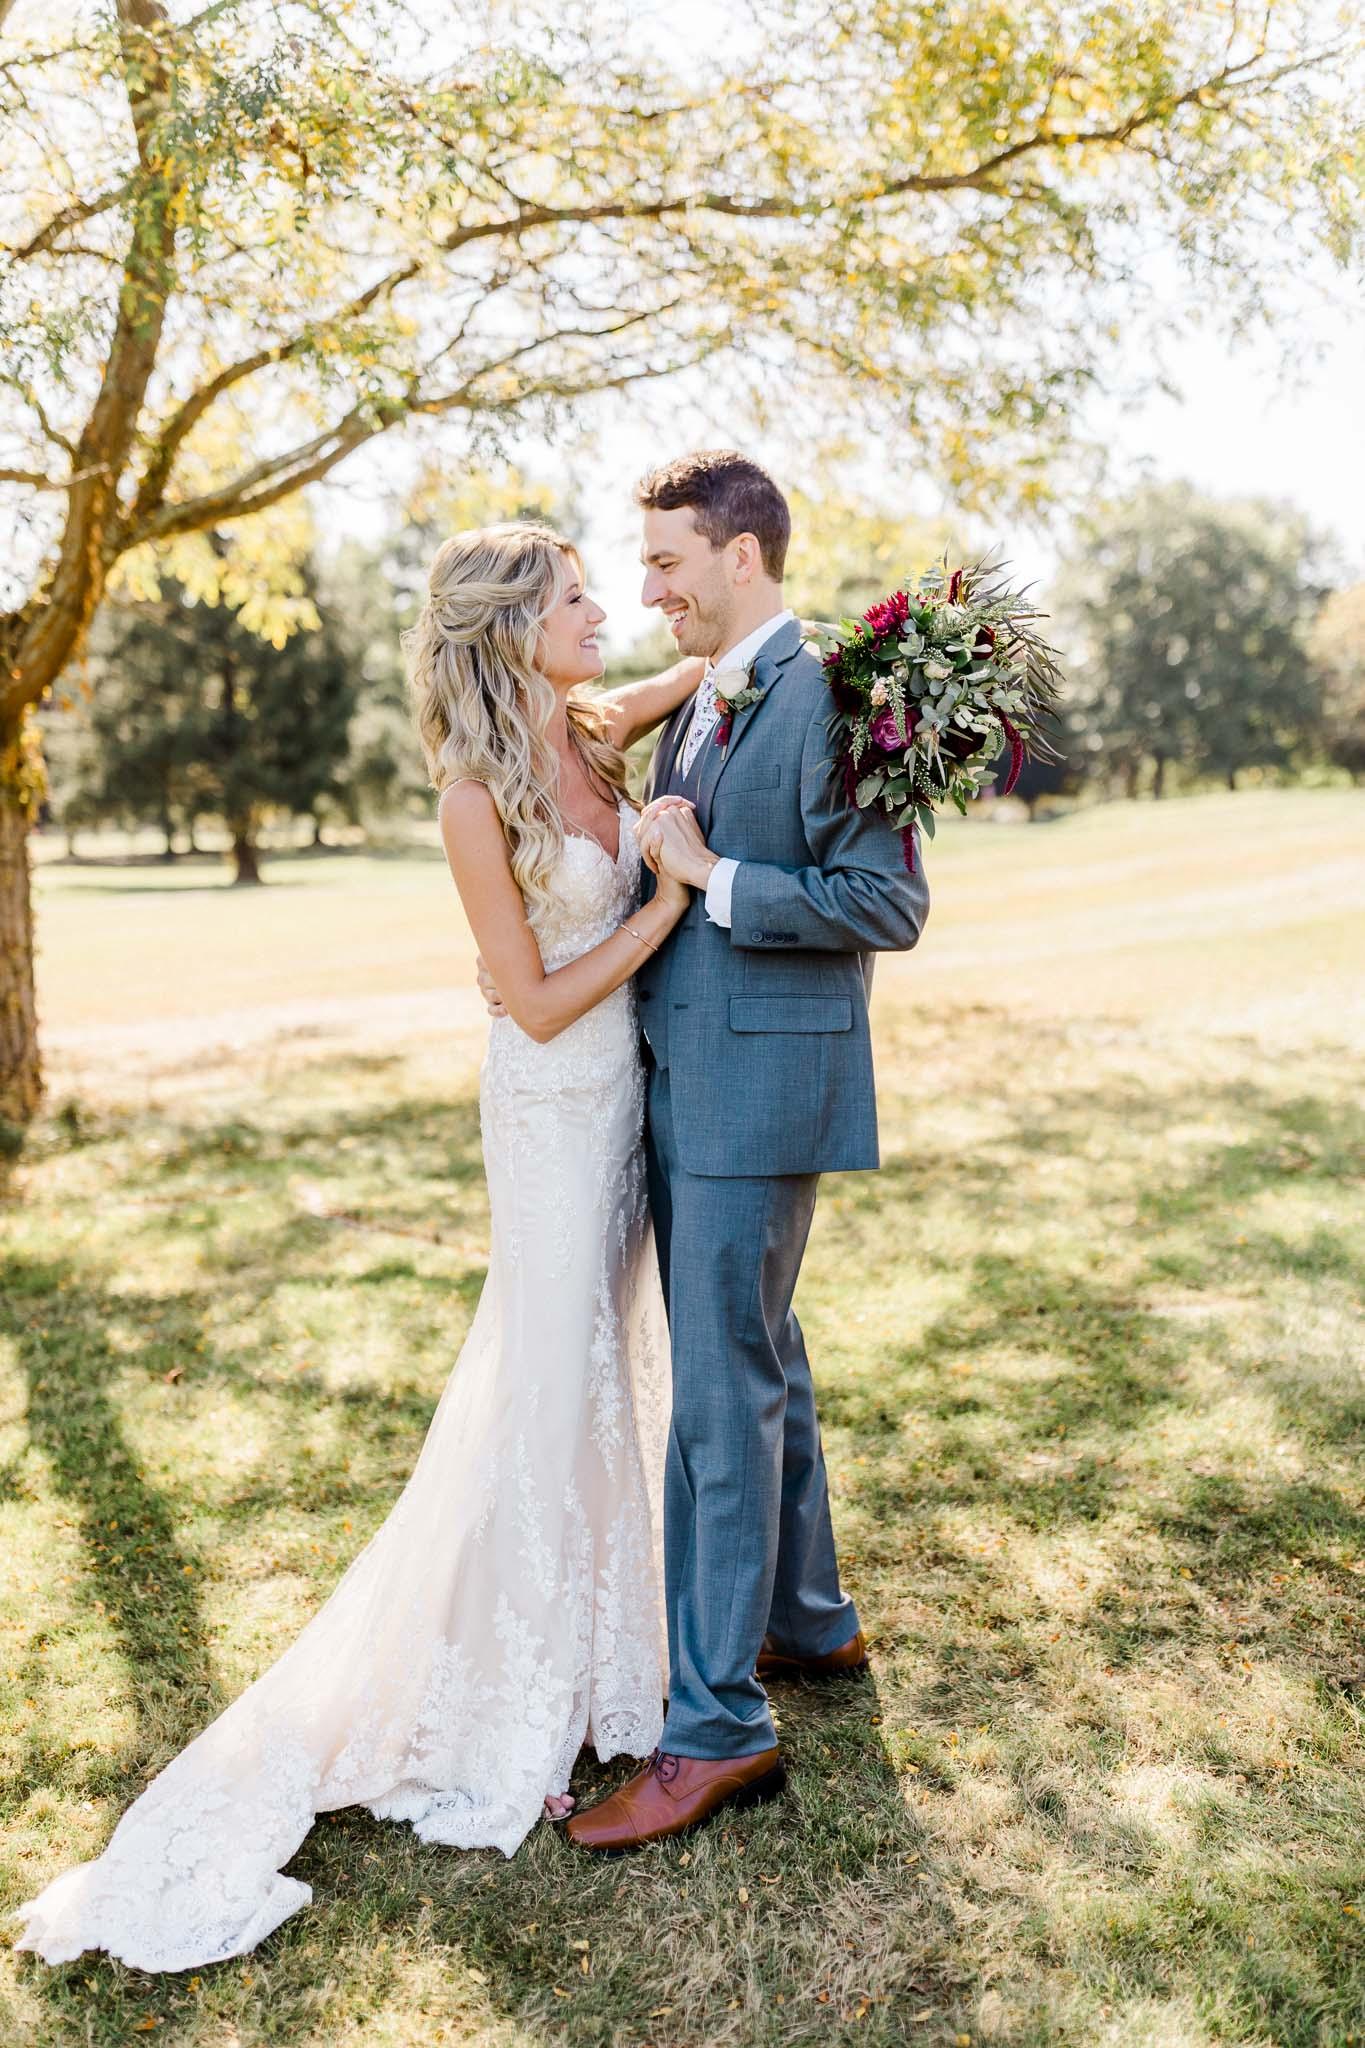 Frosty-Valley-September-Wedding-7626.jpg